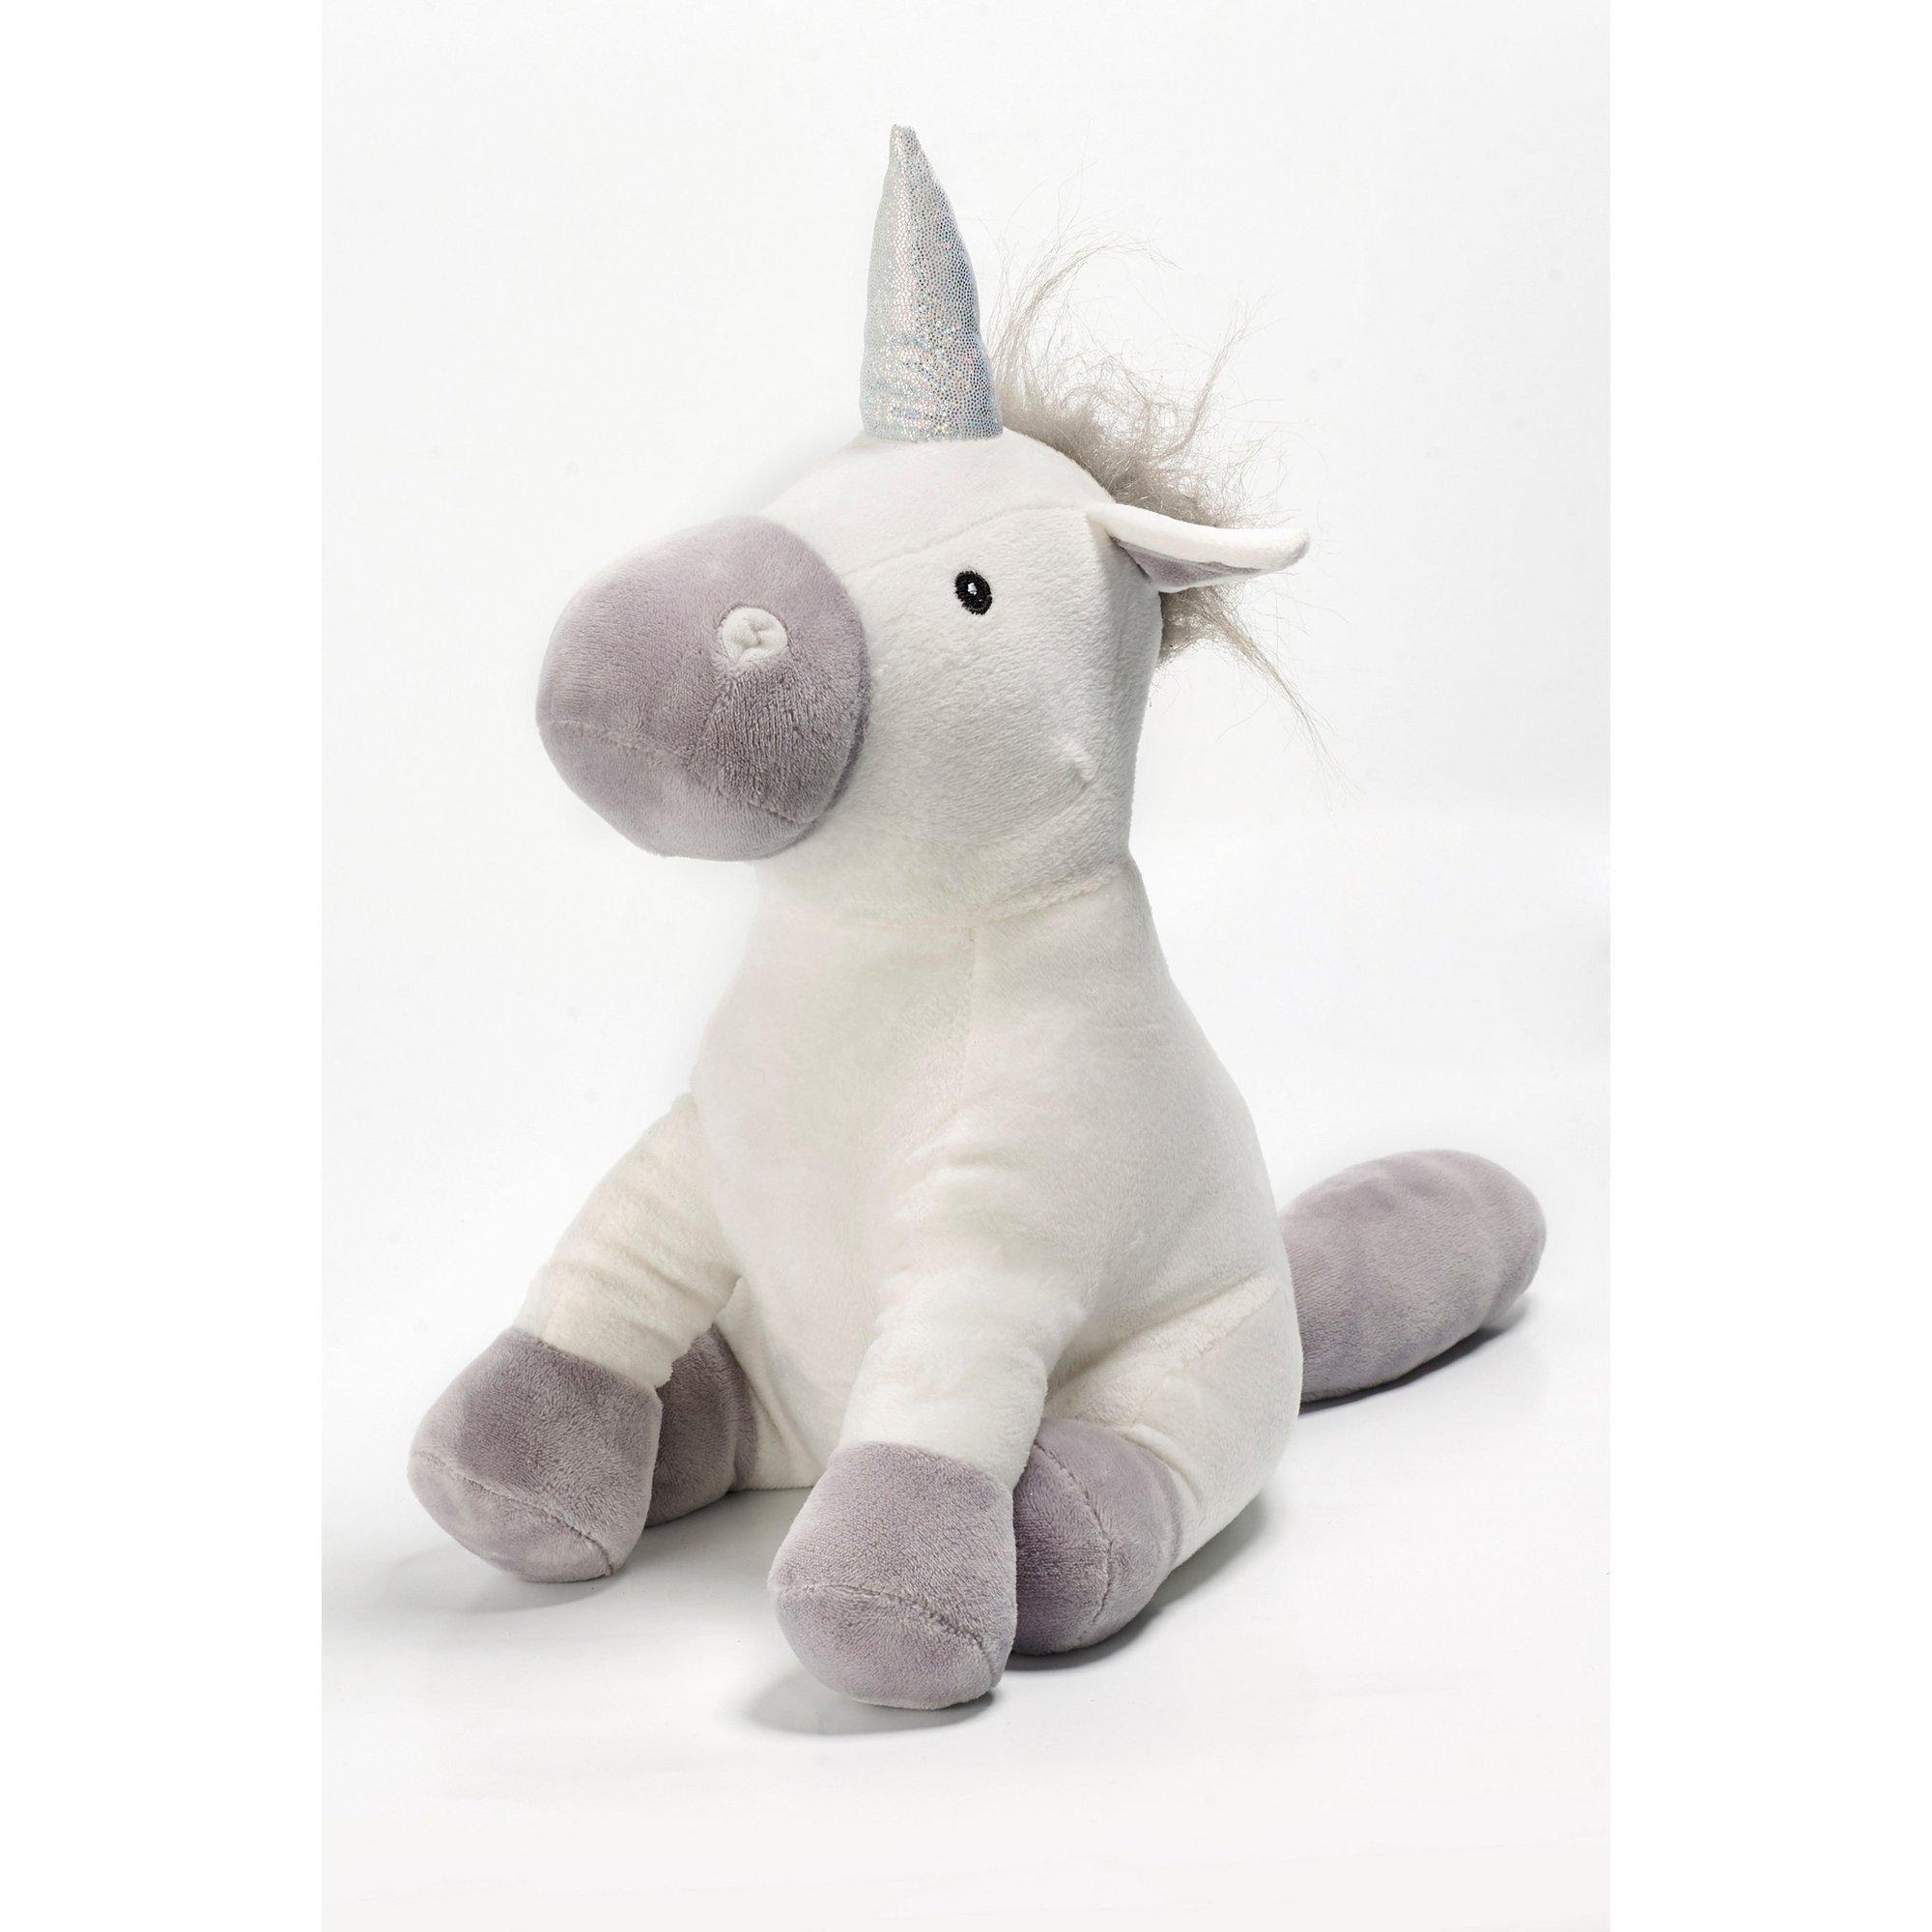 Image of Cosy Unicorn Doorstop